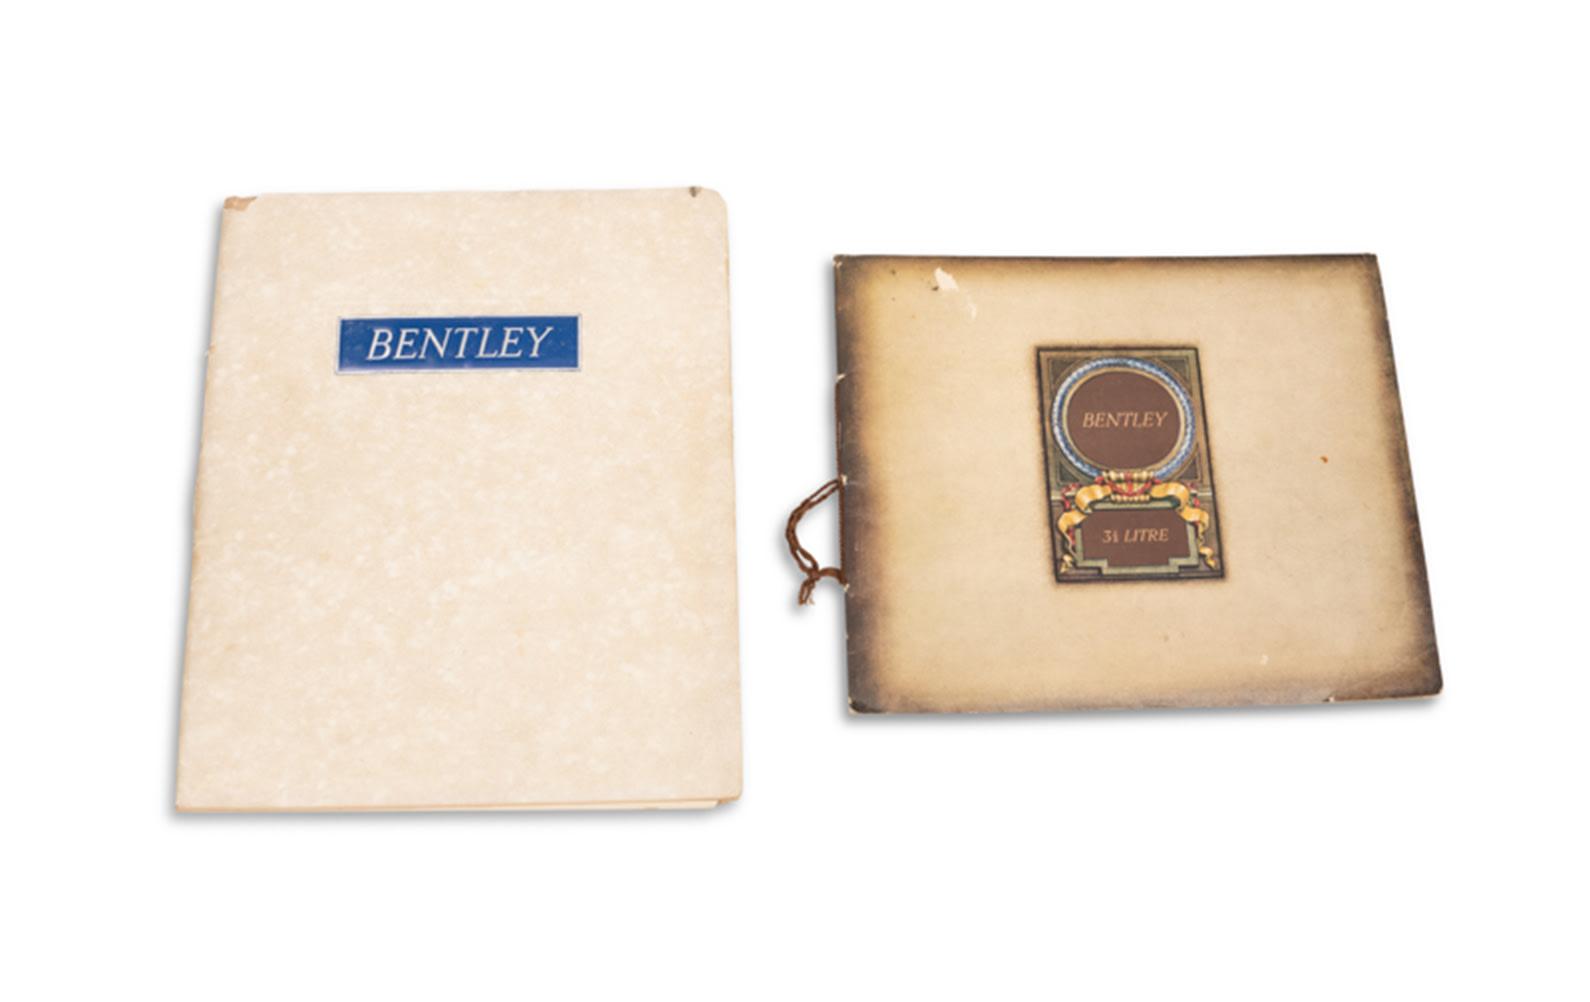 Bentley Sales Brochures for 3 1/2 and 4 1/4 Litre Models